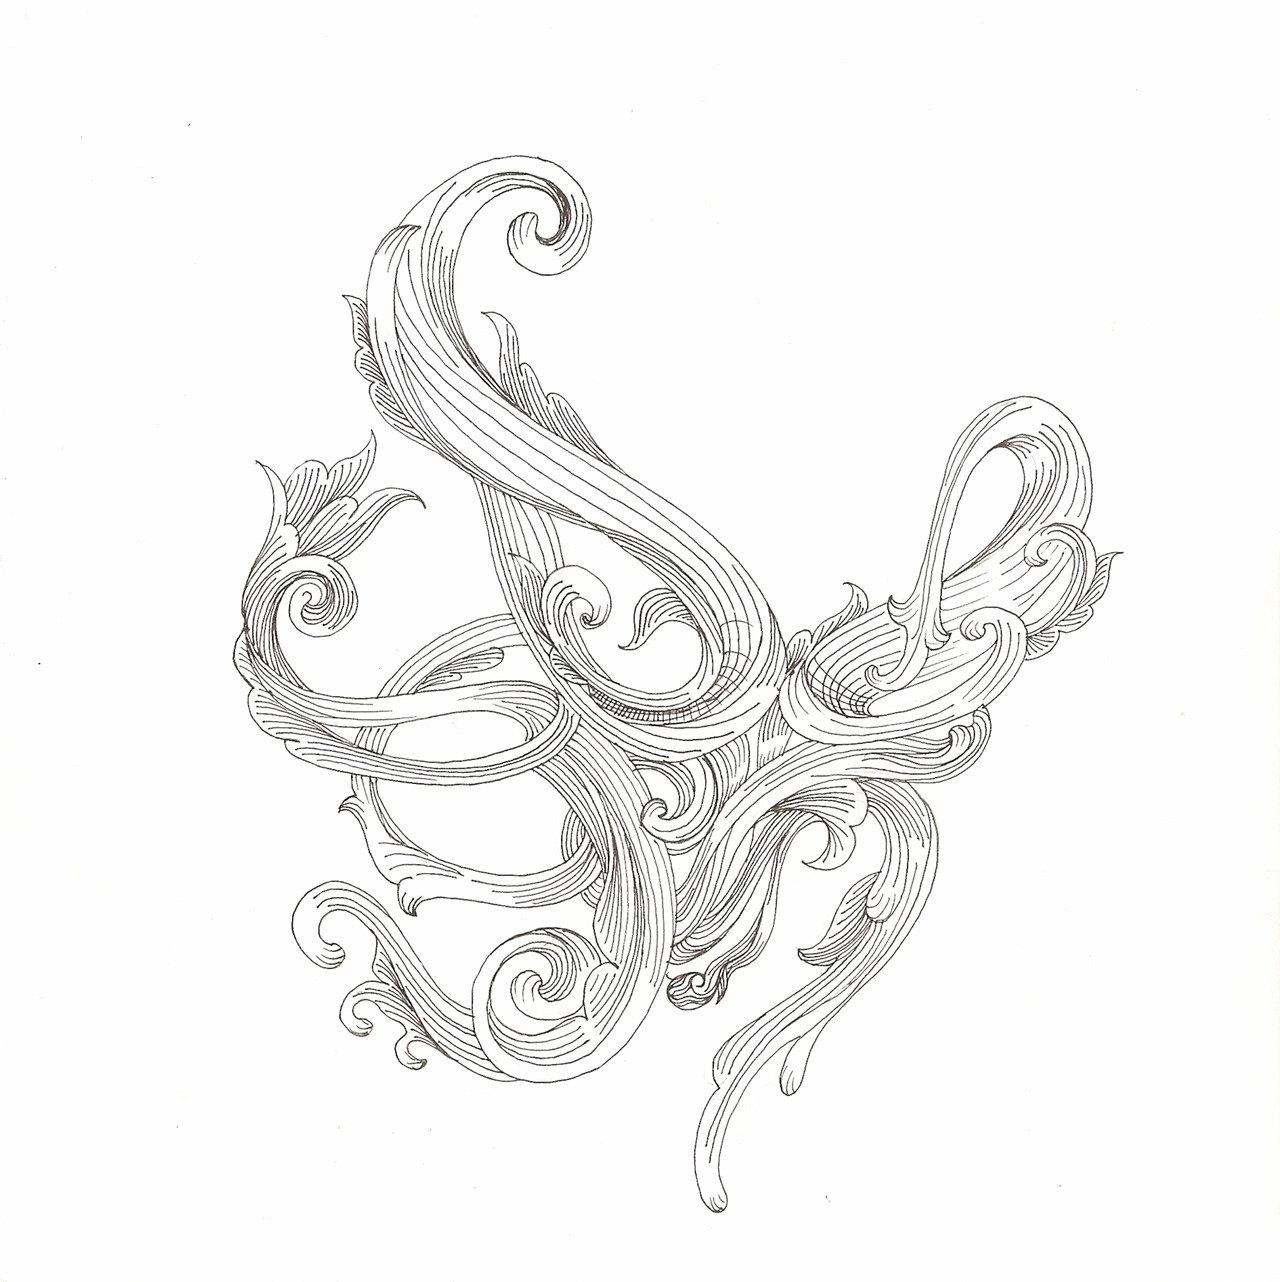 1280x1282 Octopus Drawing Scrollwork Cephalopod 2 Original